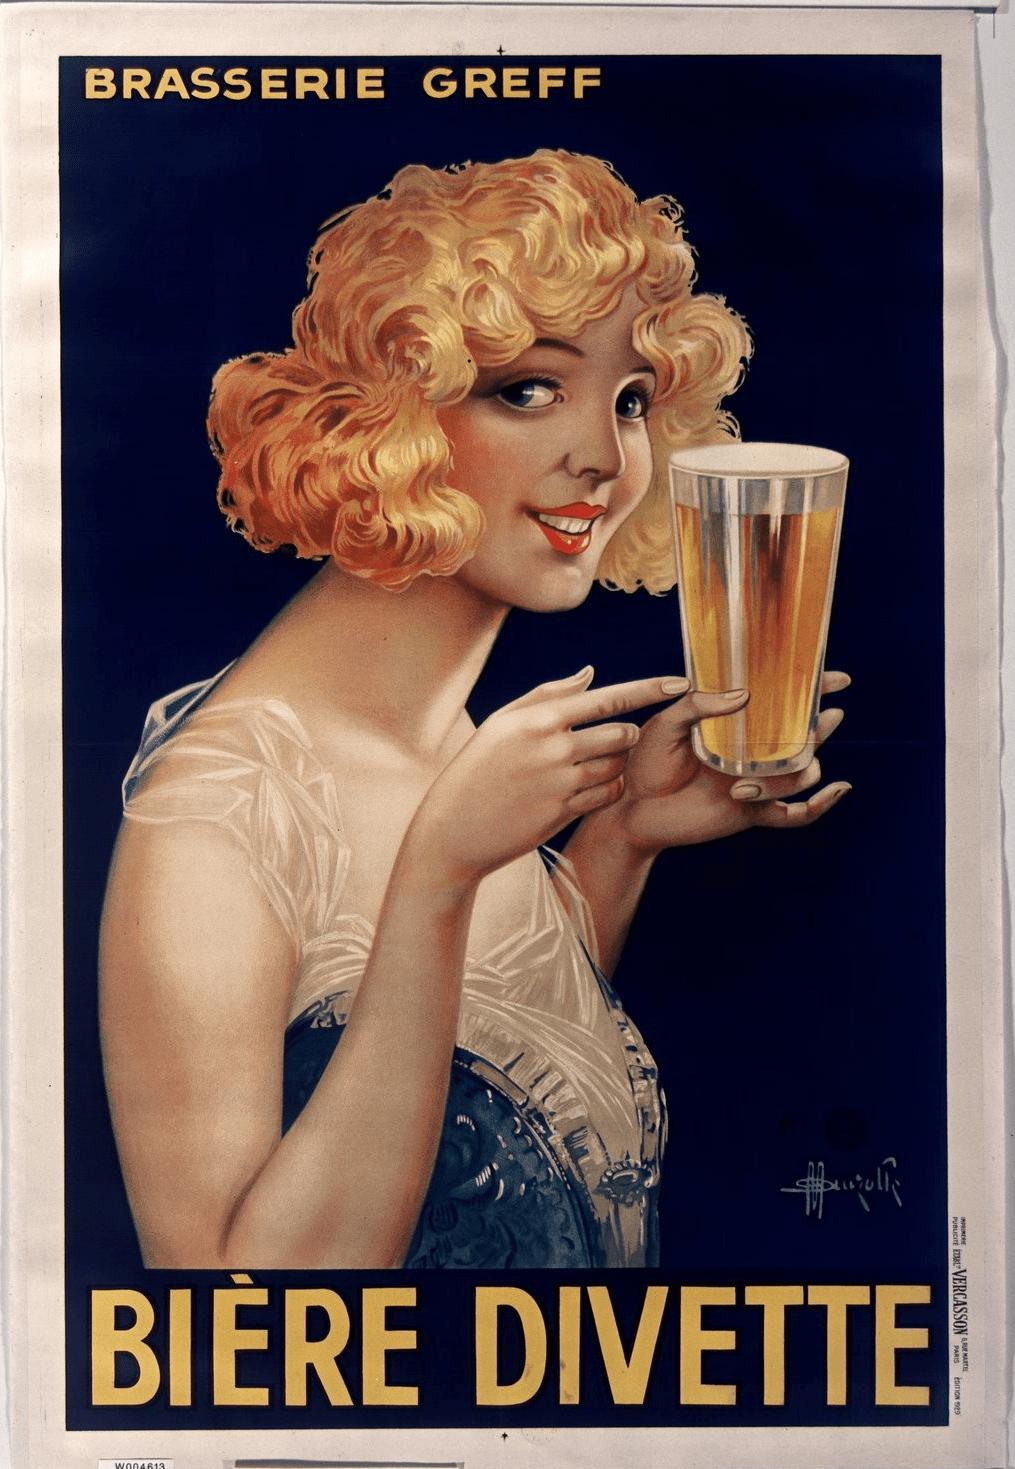 Brasserie Greff, Bière Divette